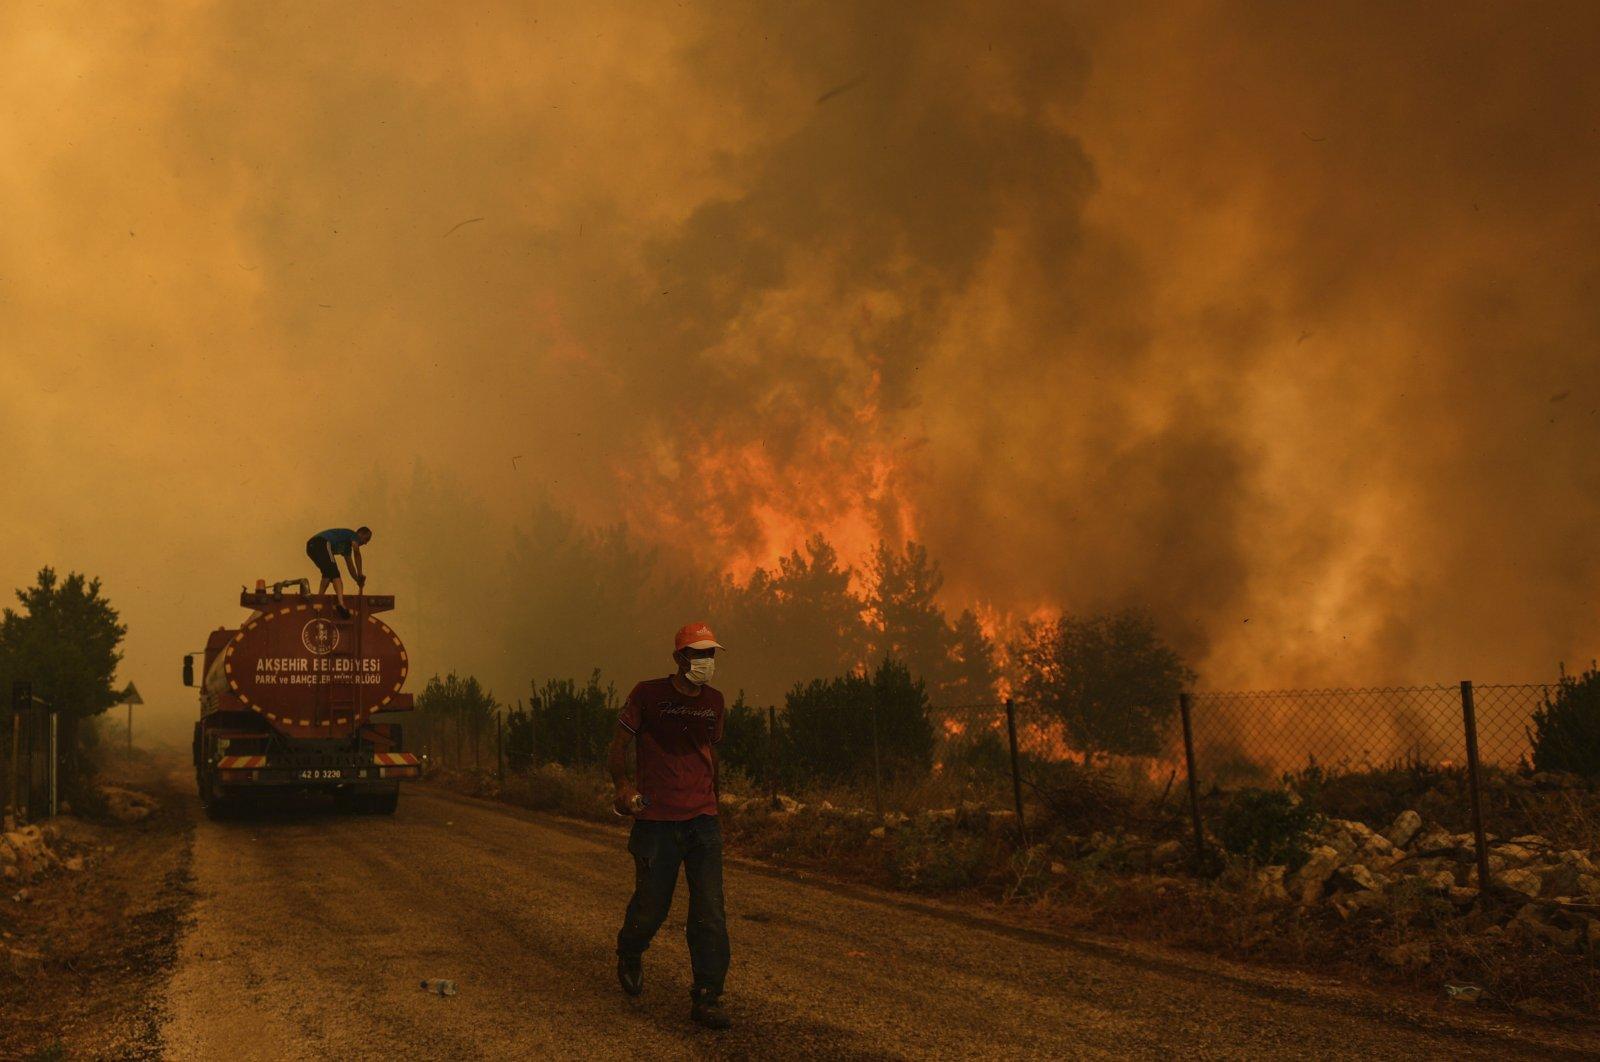 A man down a road in the fire-devastating Sirtköy village, near Manavgat, Antalya, Turkey, Sunday, Aug. 1, 2021. (AP Photo)